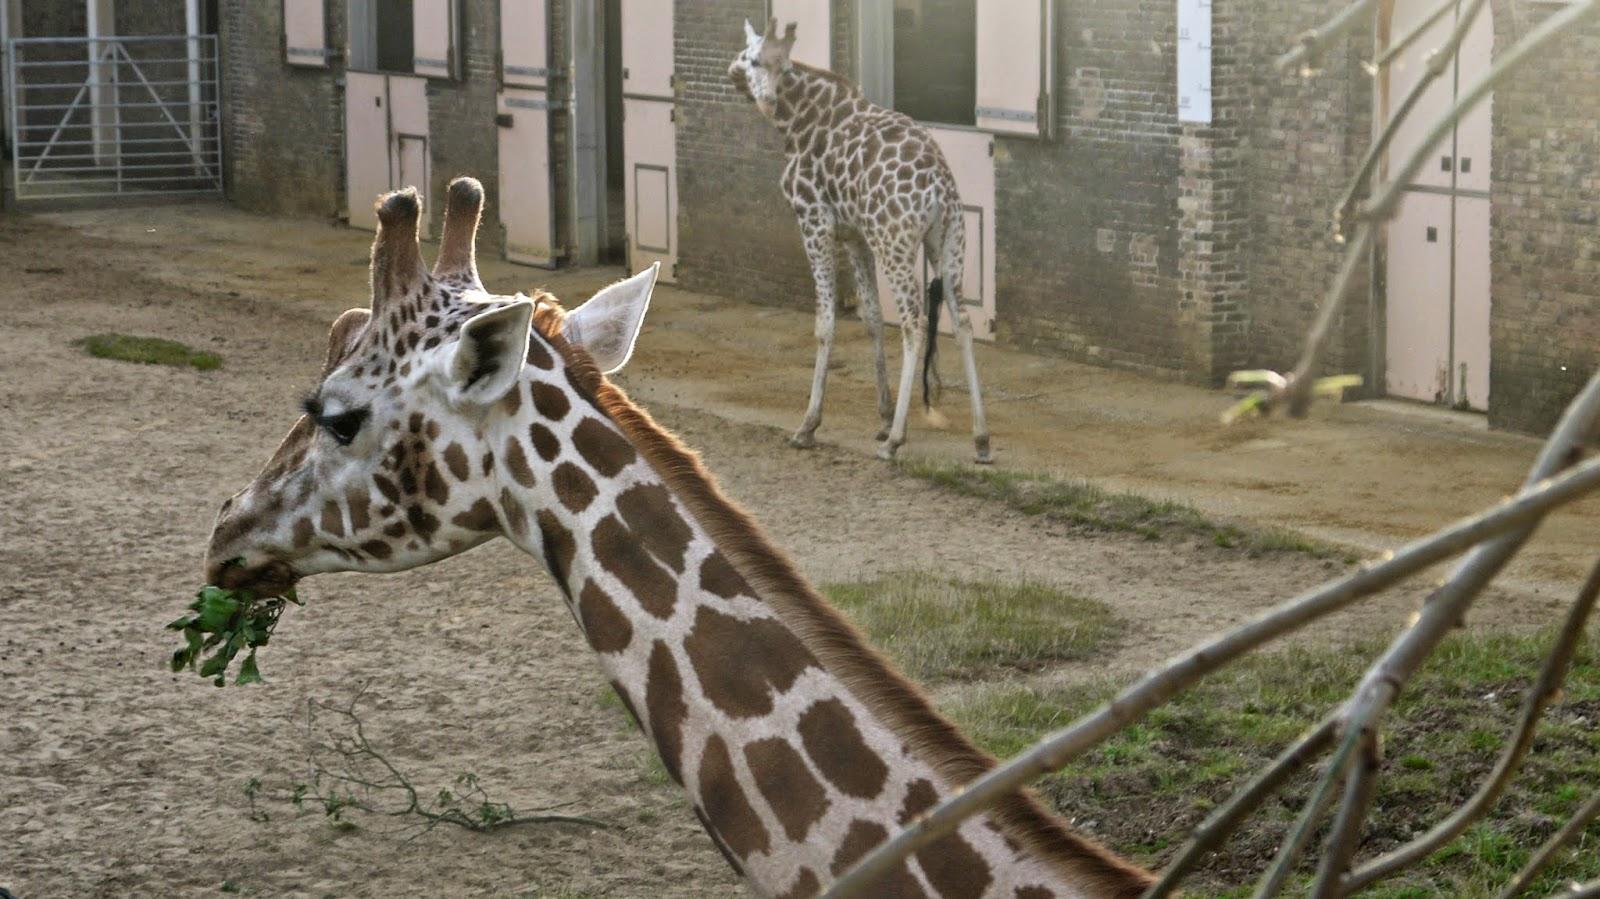 London Zoo Giraffes